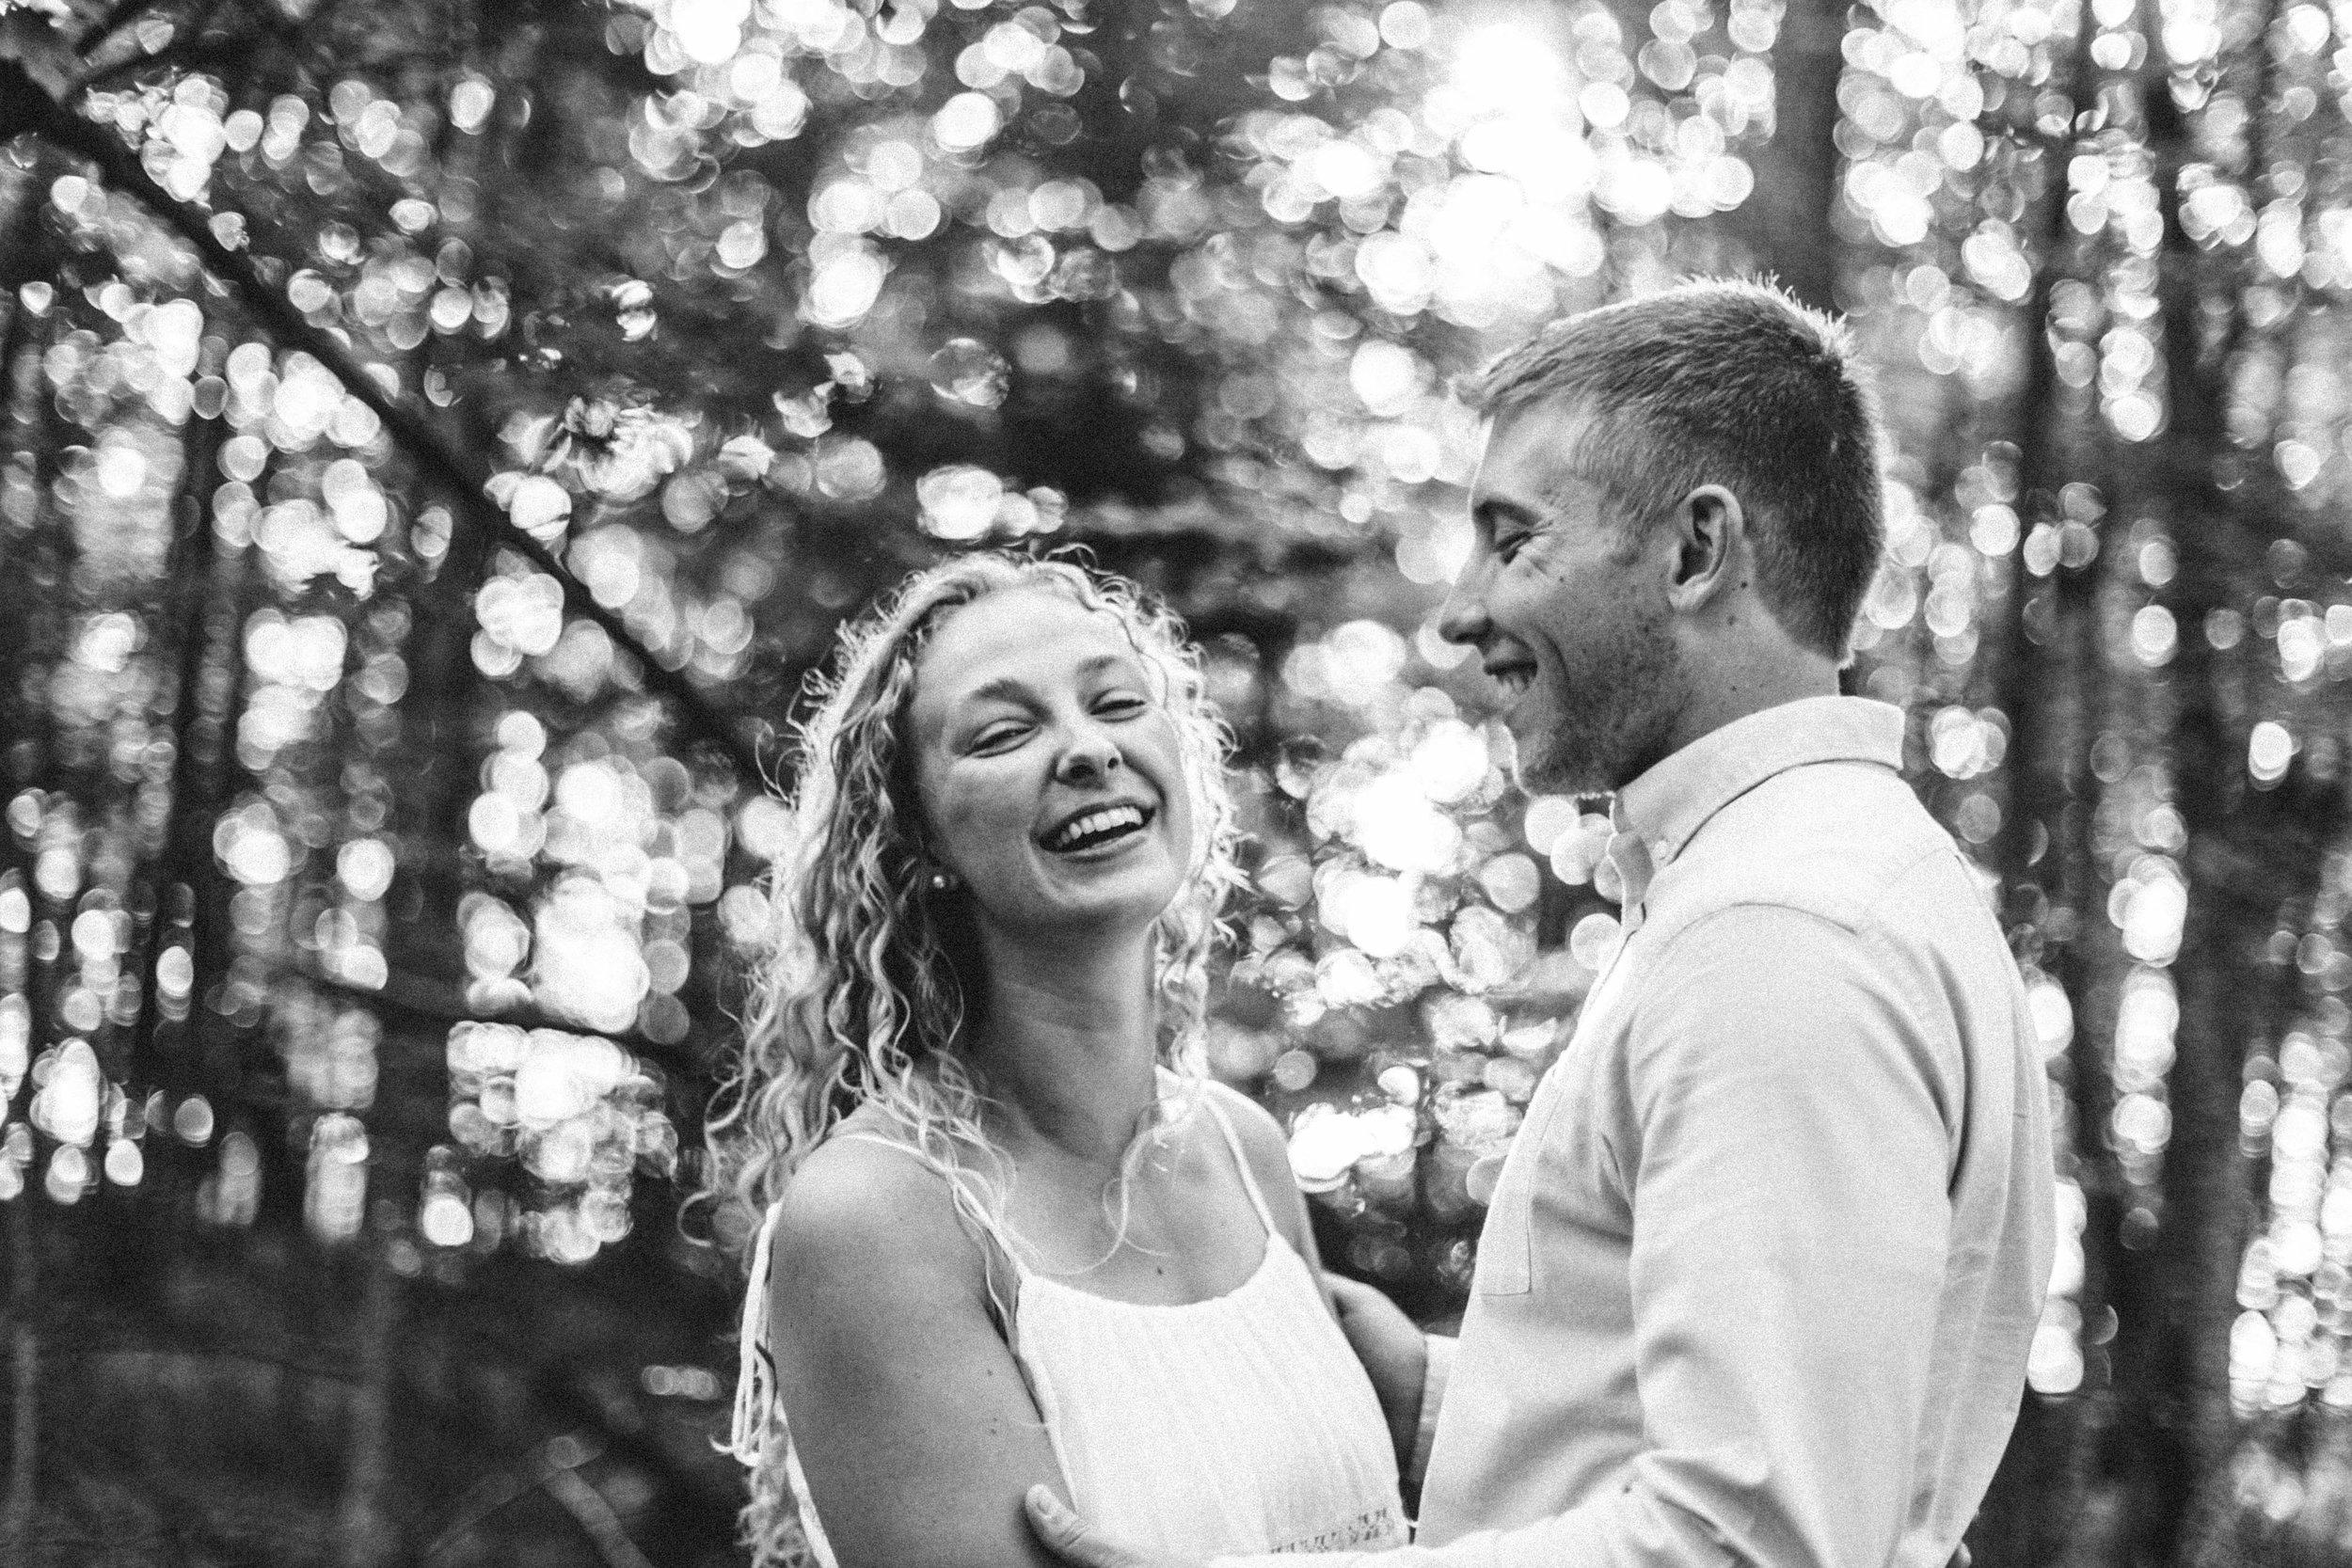 Northern Michigan Engagement Photographer - Lauren and Brent 014.jpg